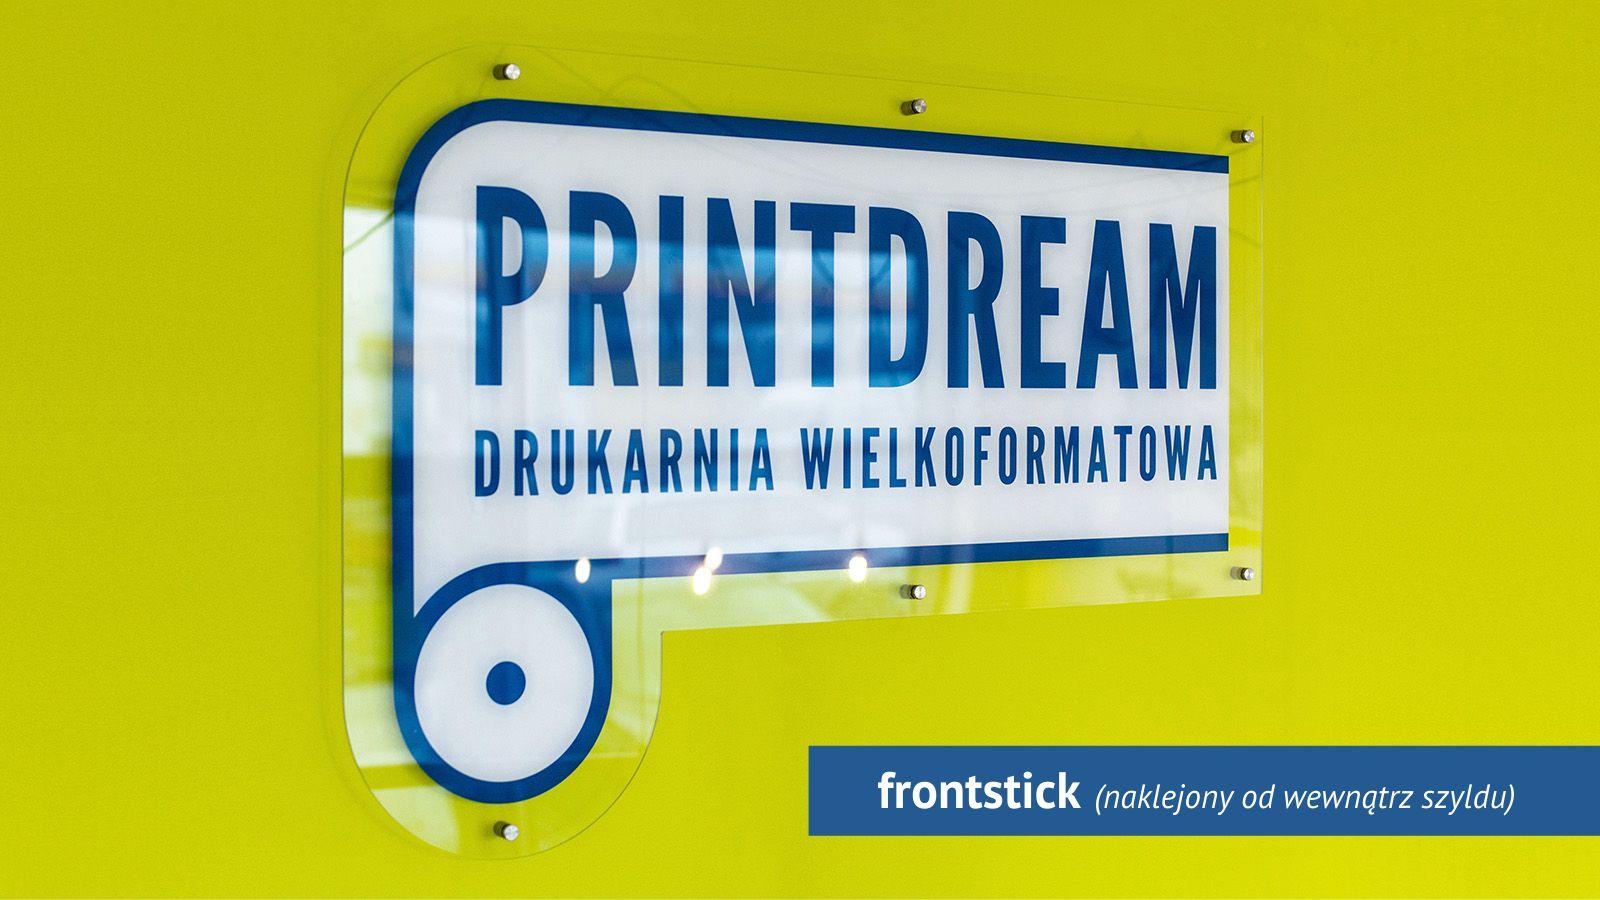 Printdream Folia Frontstick